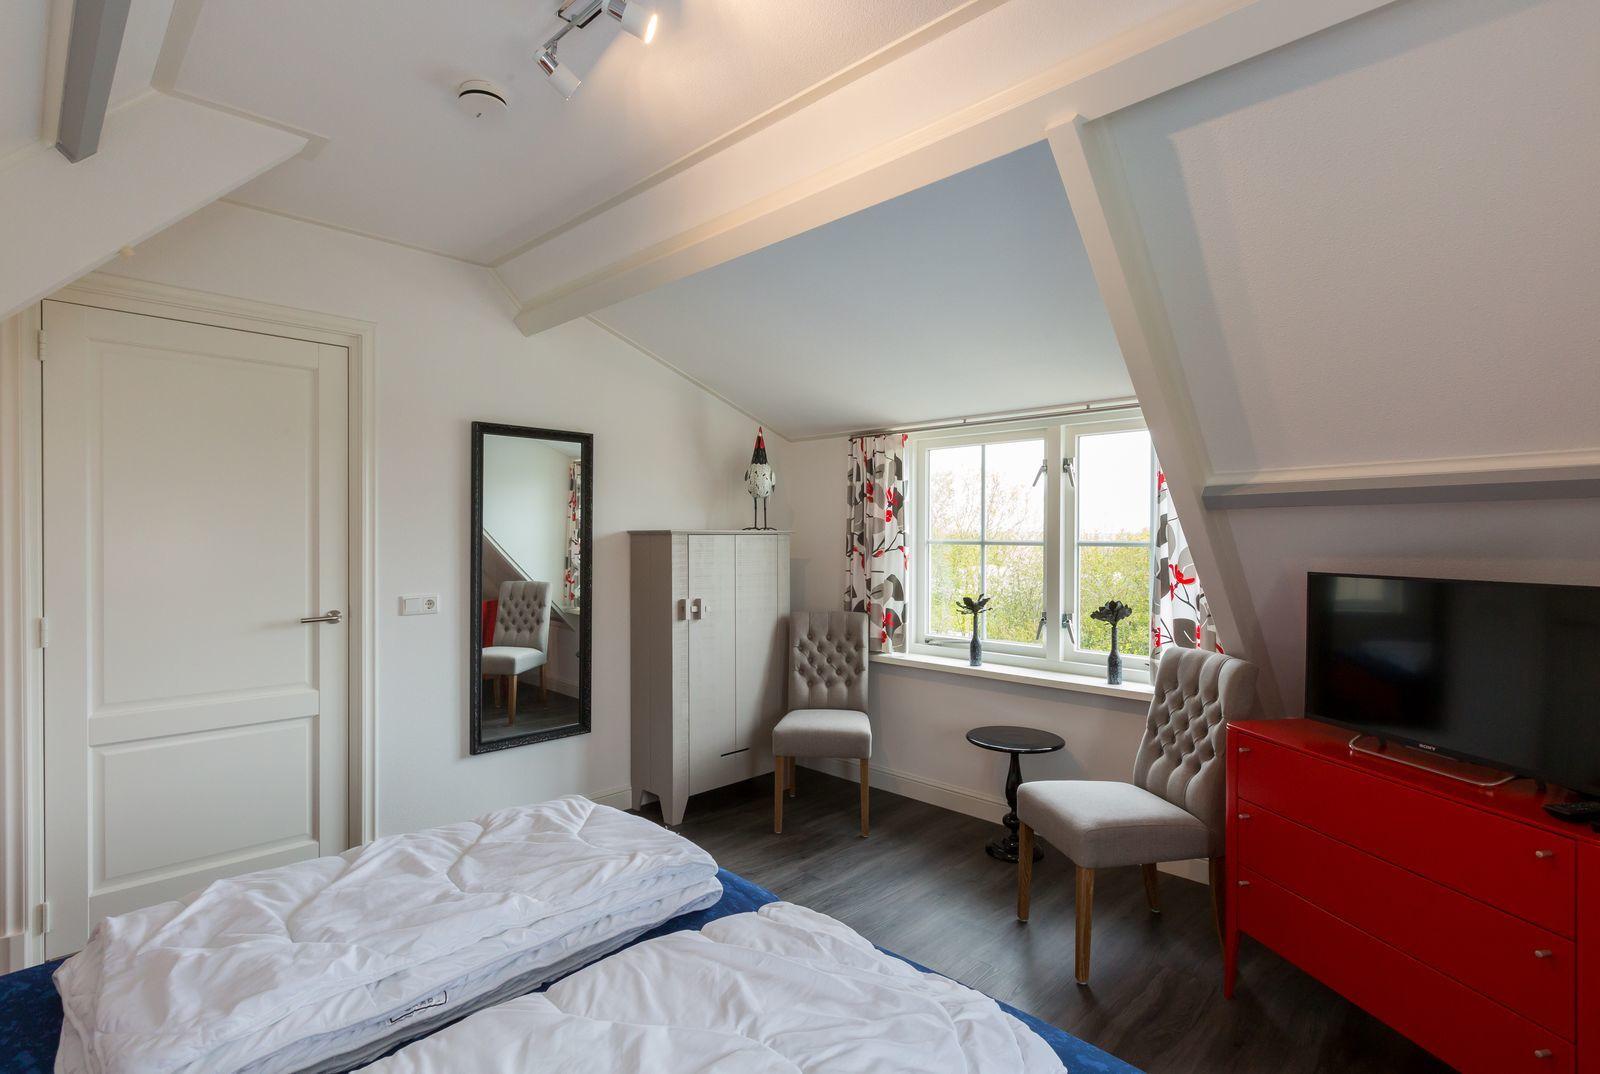 "Vakantiehuis - Prelaatweg 11 | Westkapelle 't Kippekot"""